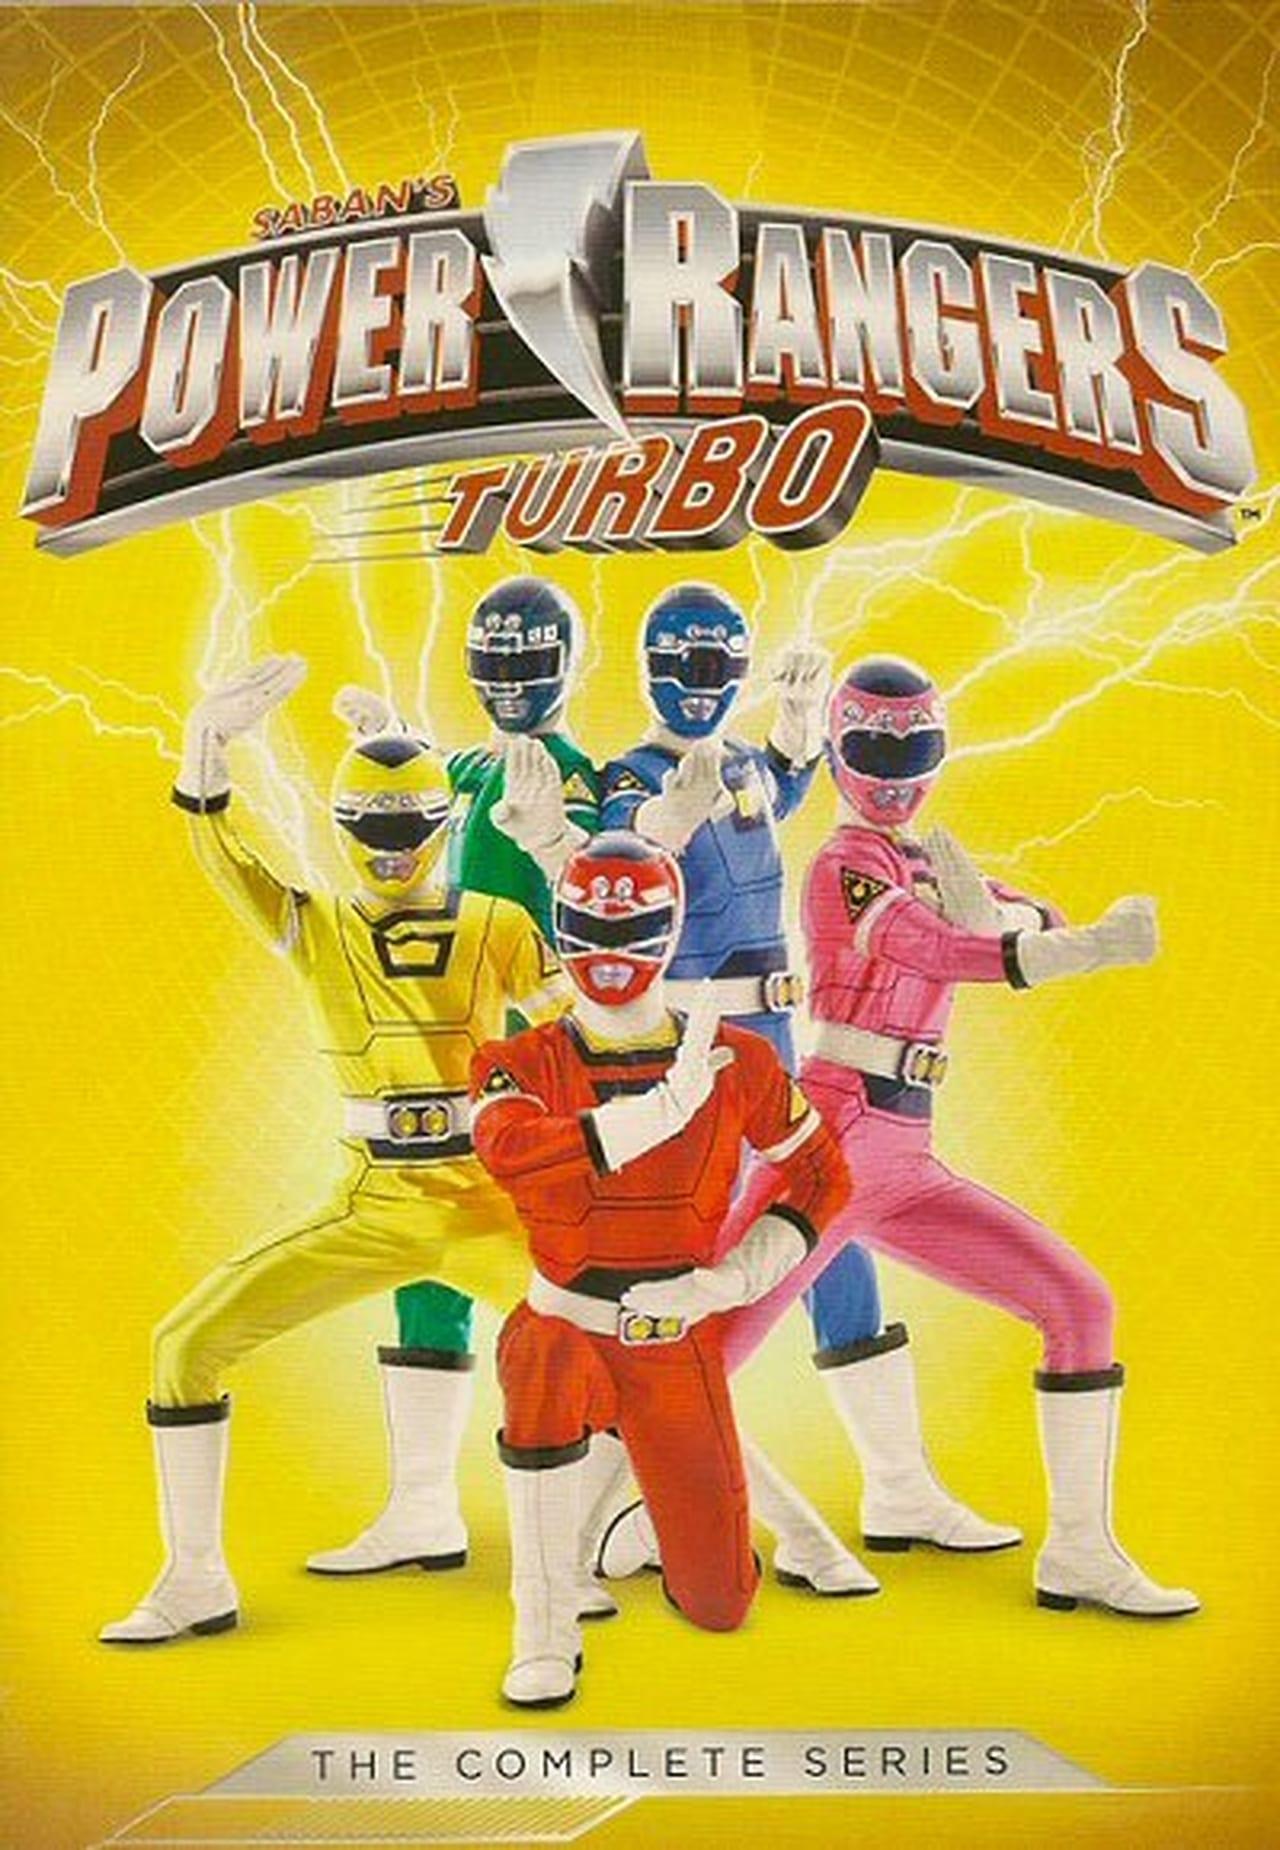 Power Rangers Season 5 (1997) putlockers cafe